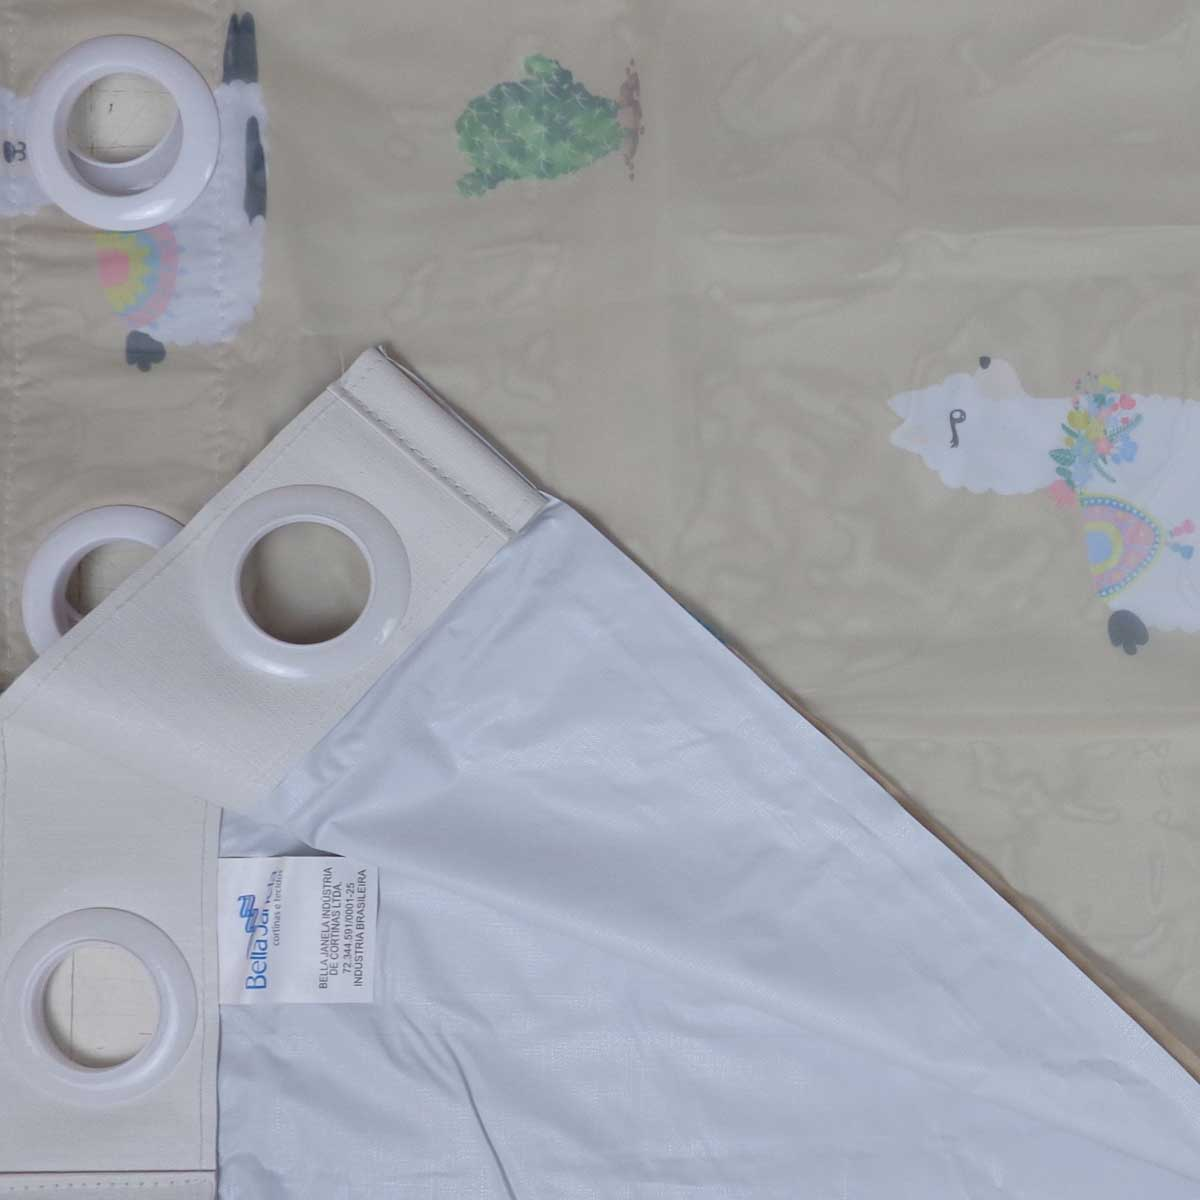 Cortina Infantil Pratika Lhama Com Forro Blackout 2,60 x 1,70 Bella Janela